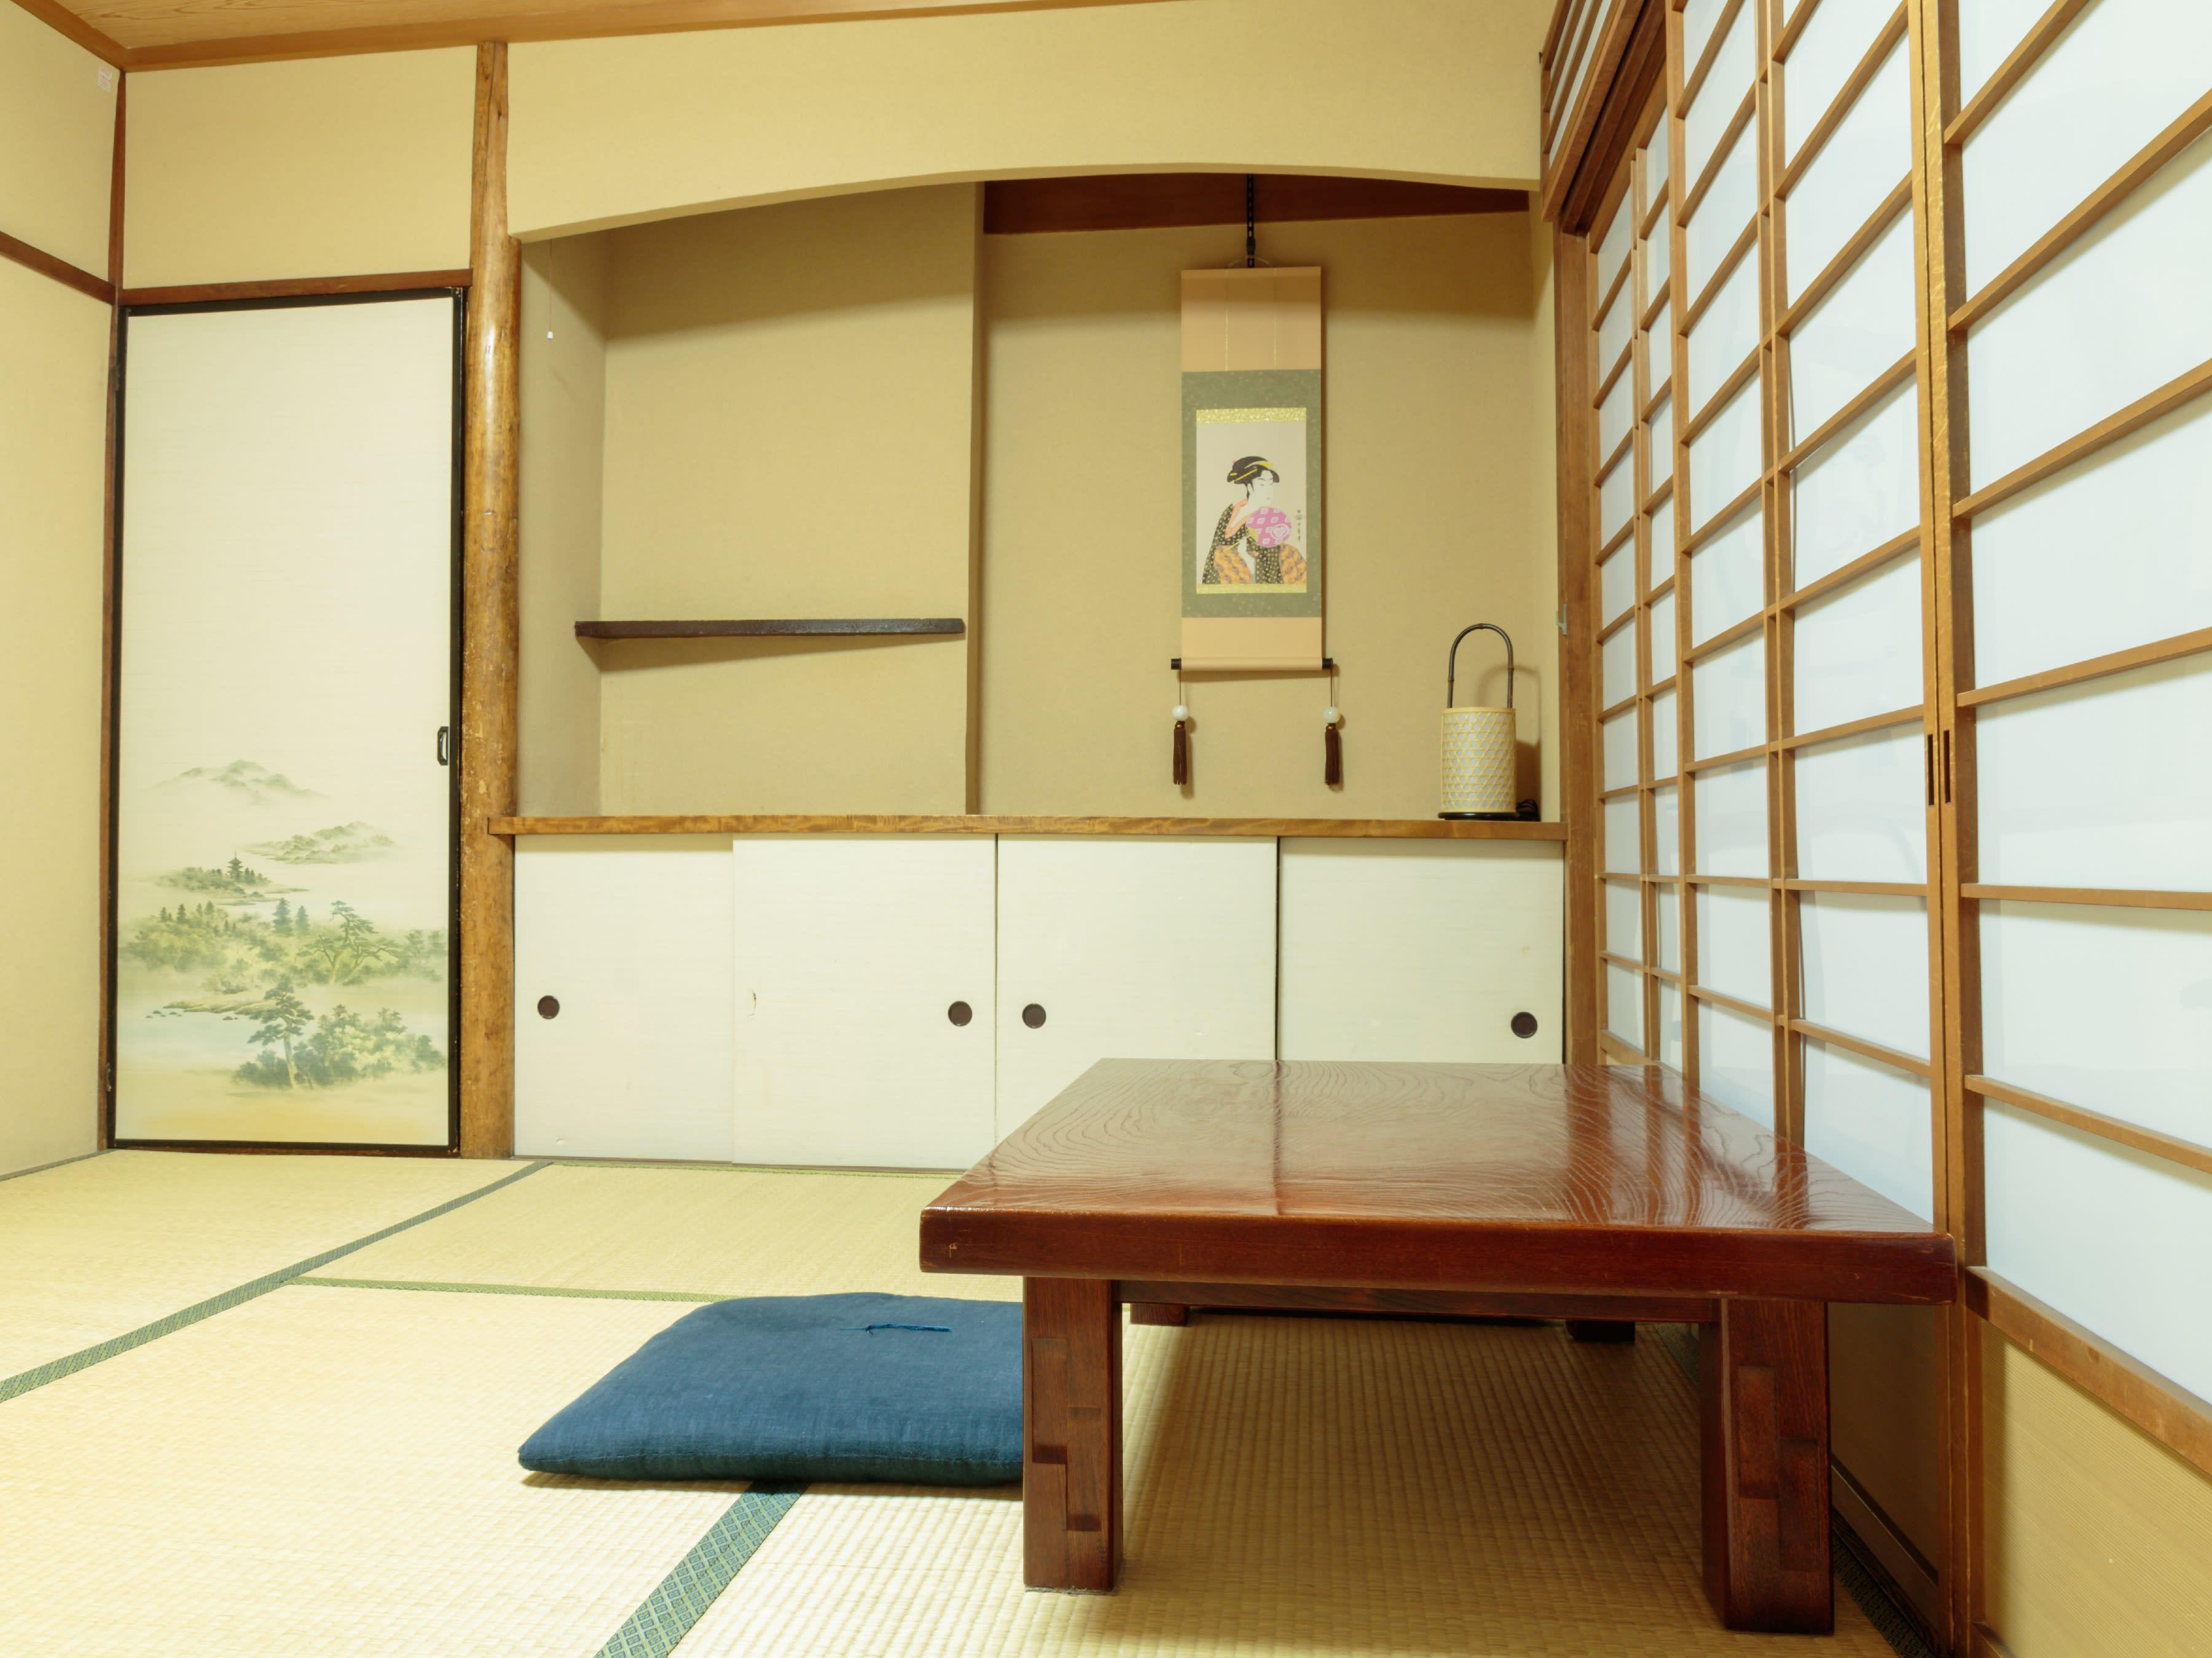 HOSTEL - Gion Ryokan Q-beh